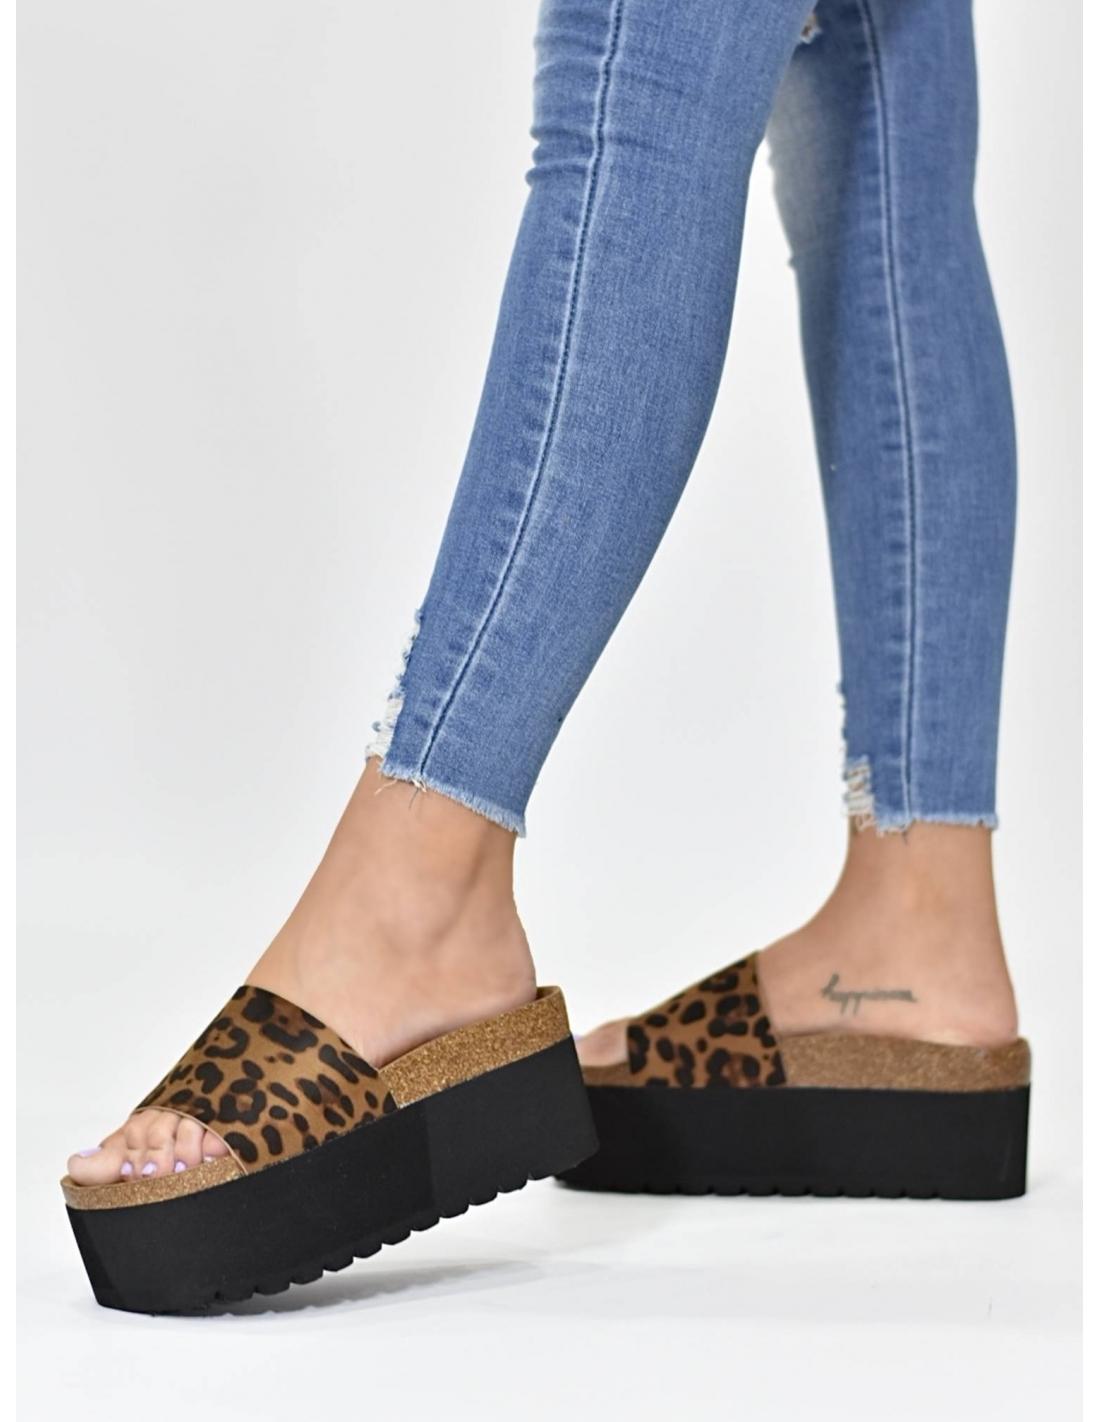 Sandalia basten leopardo